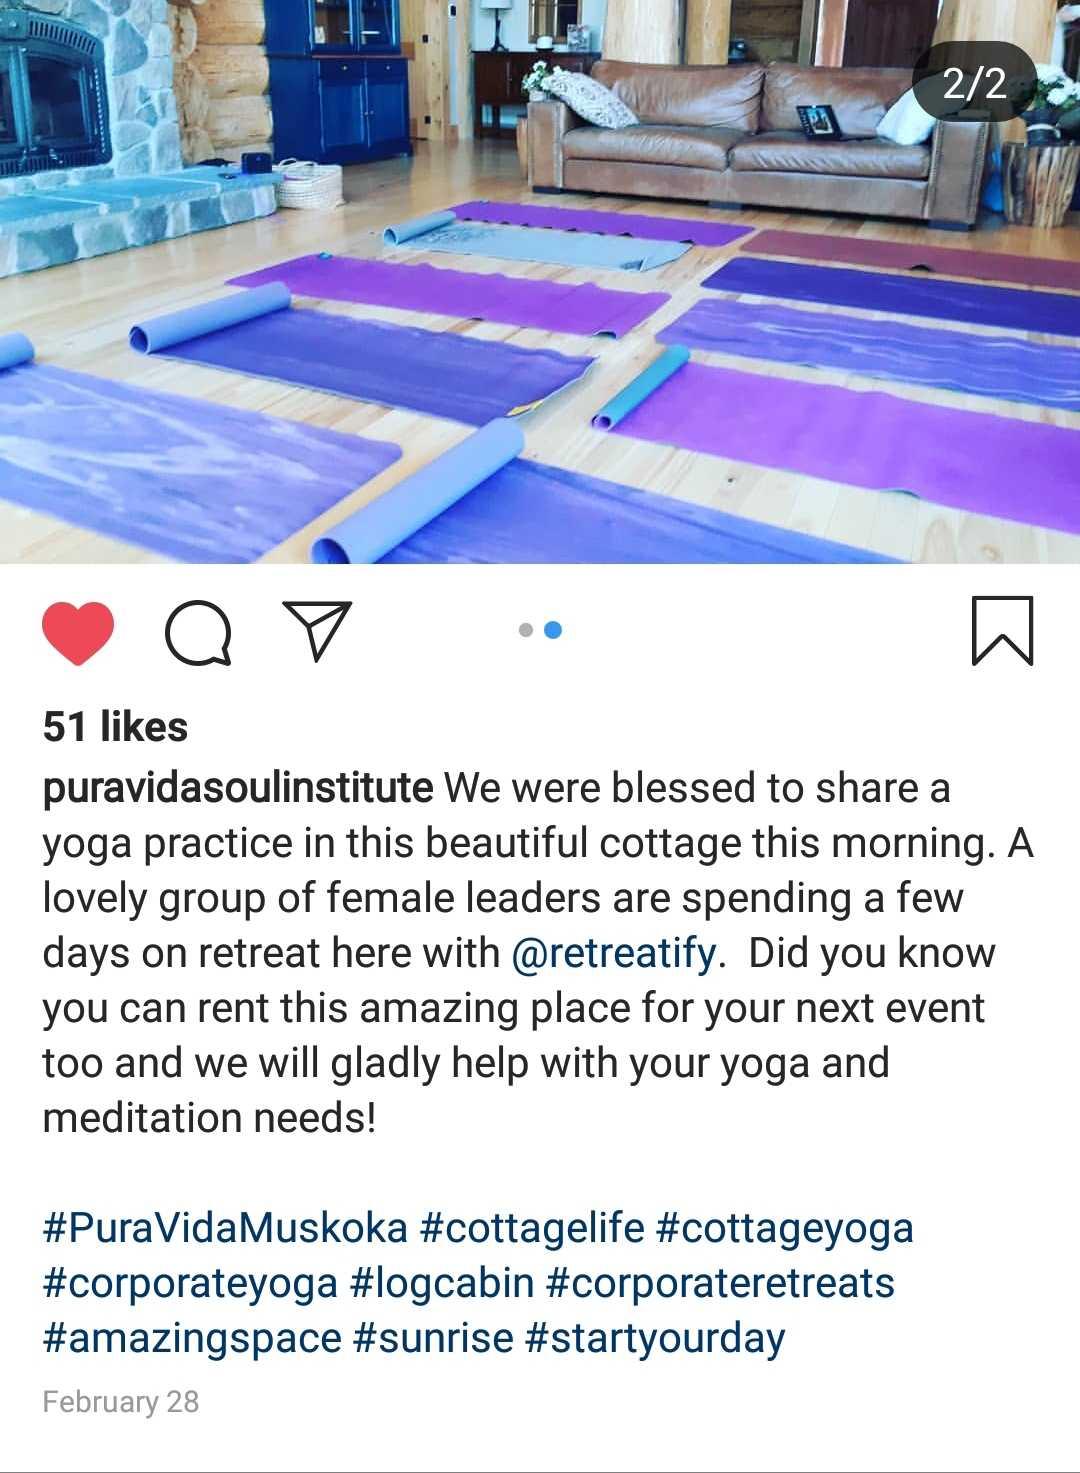 Pura Vida Soul Institute